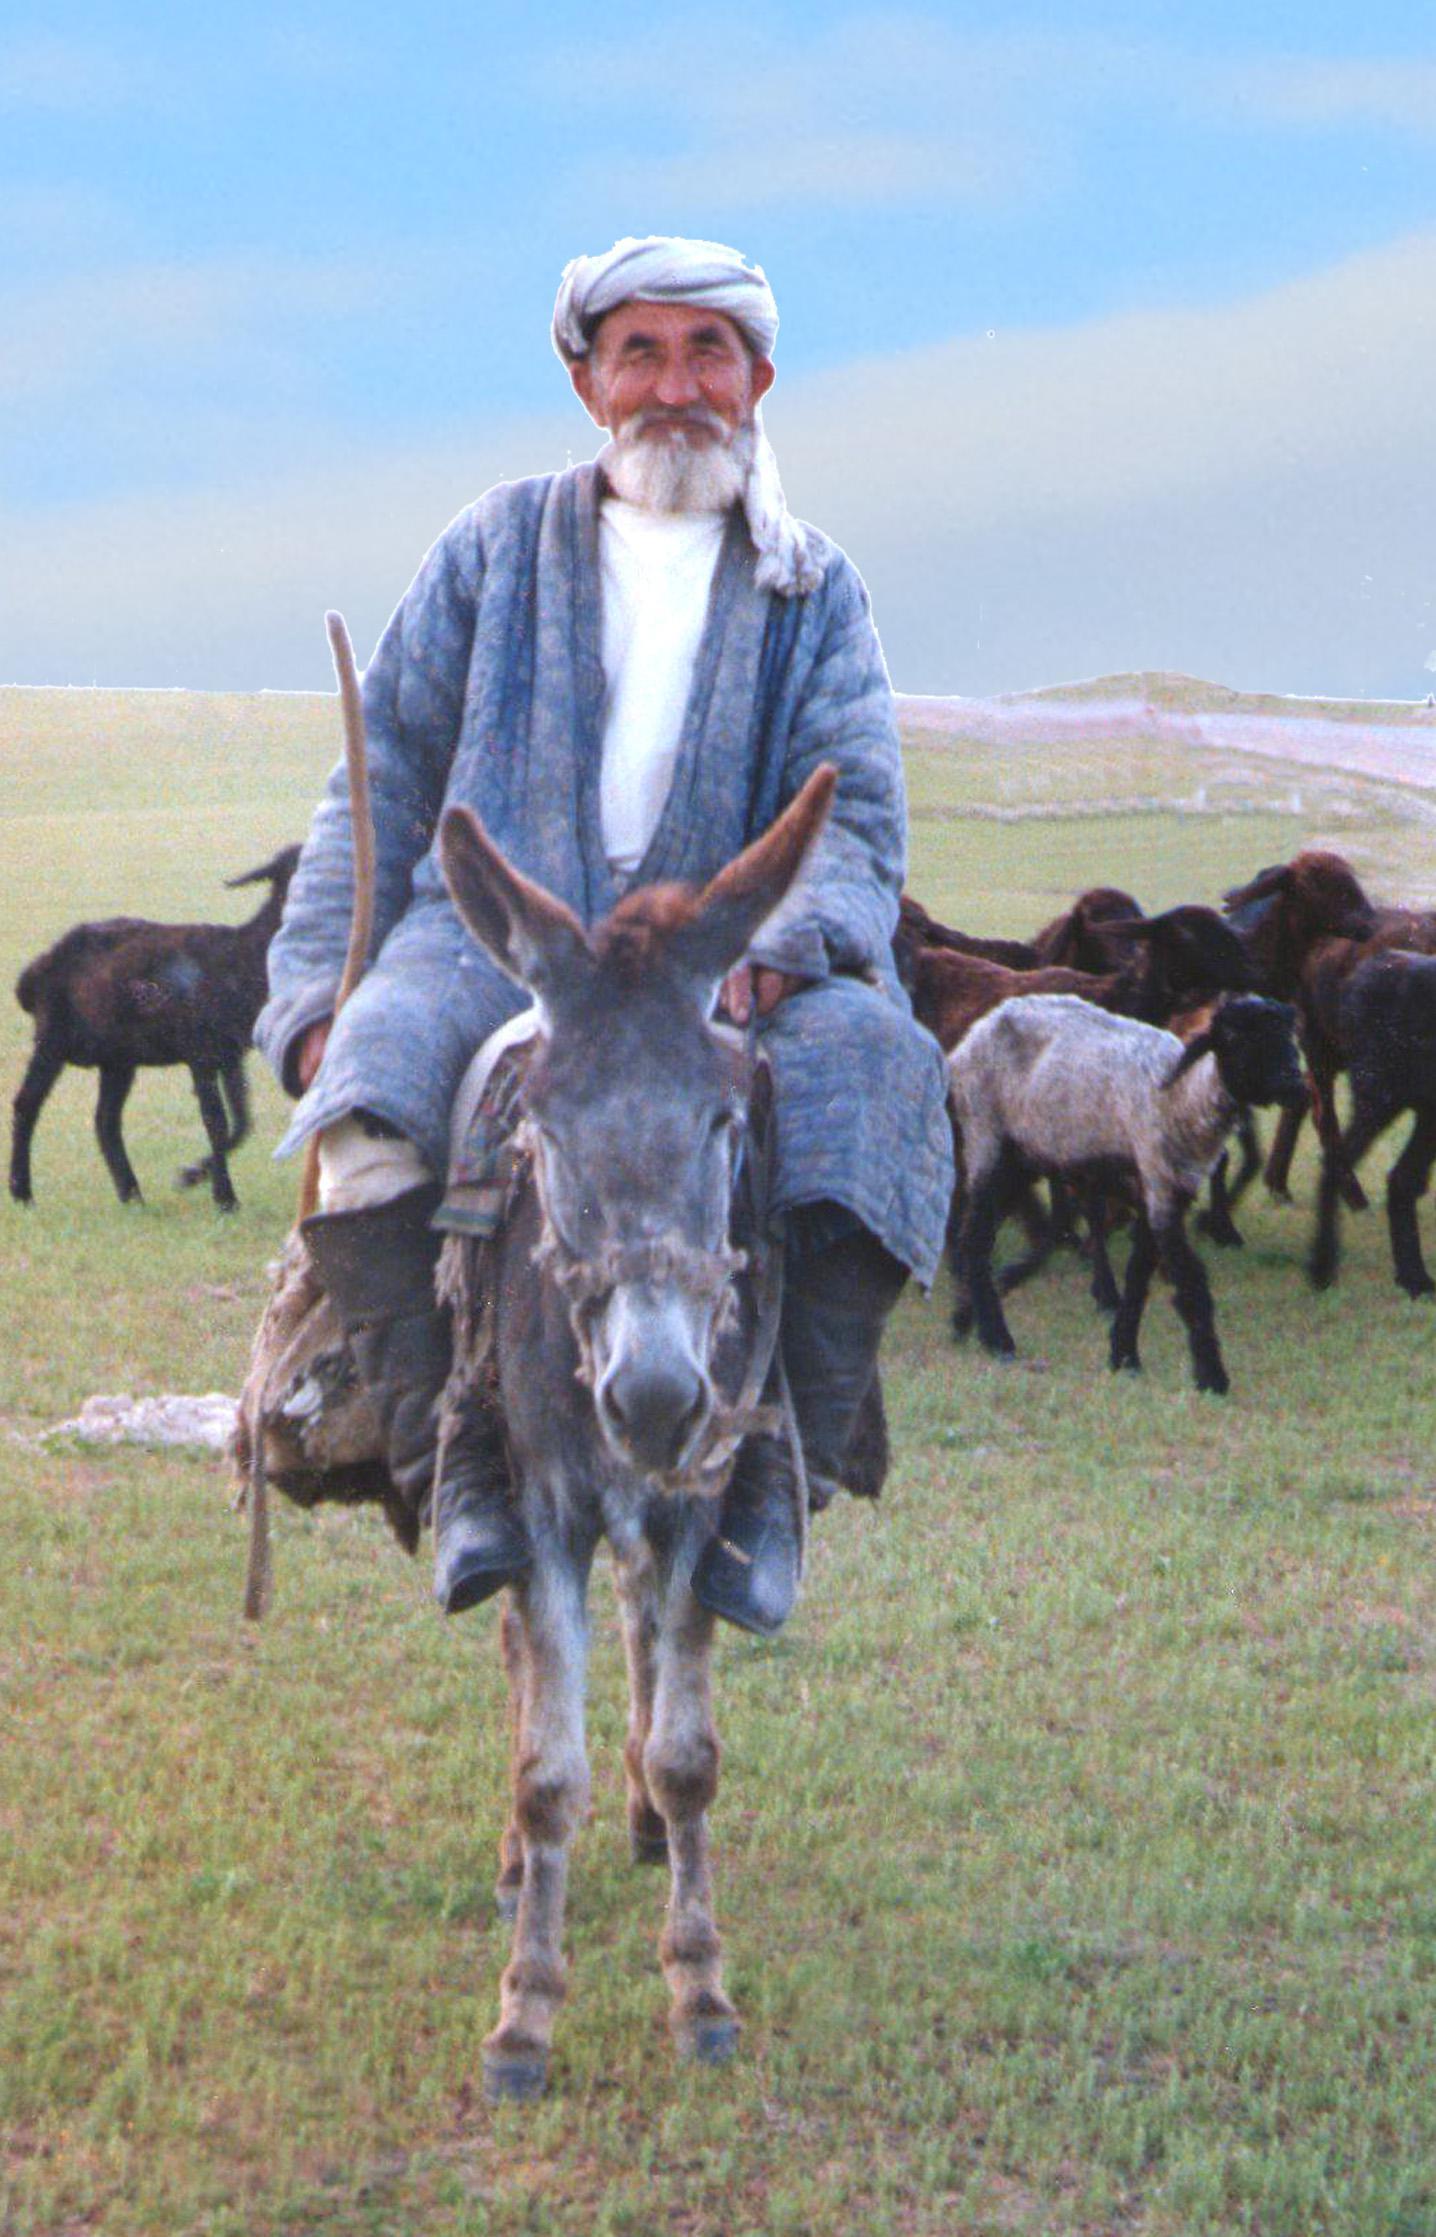 biblical man on donkey